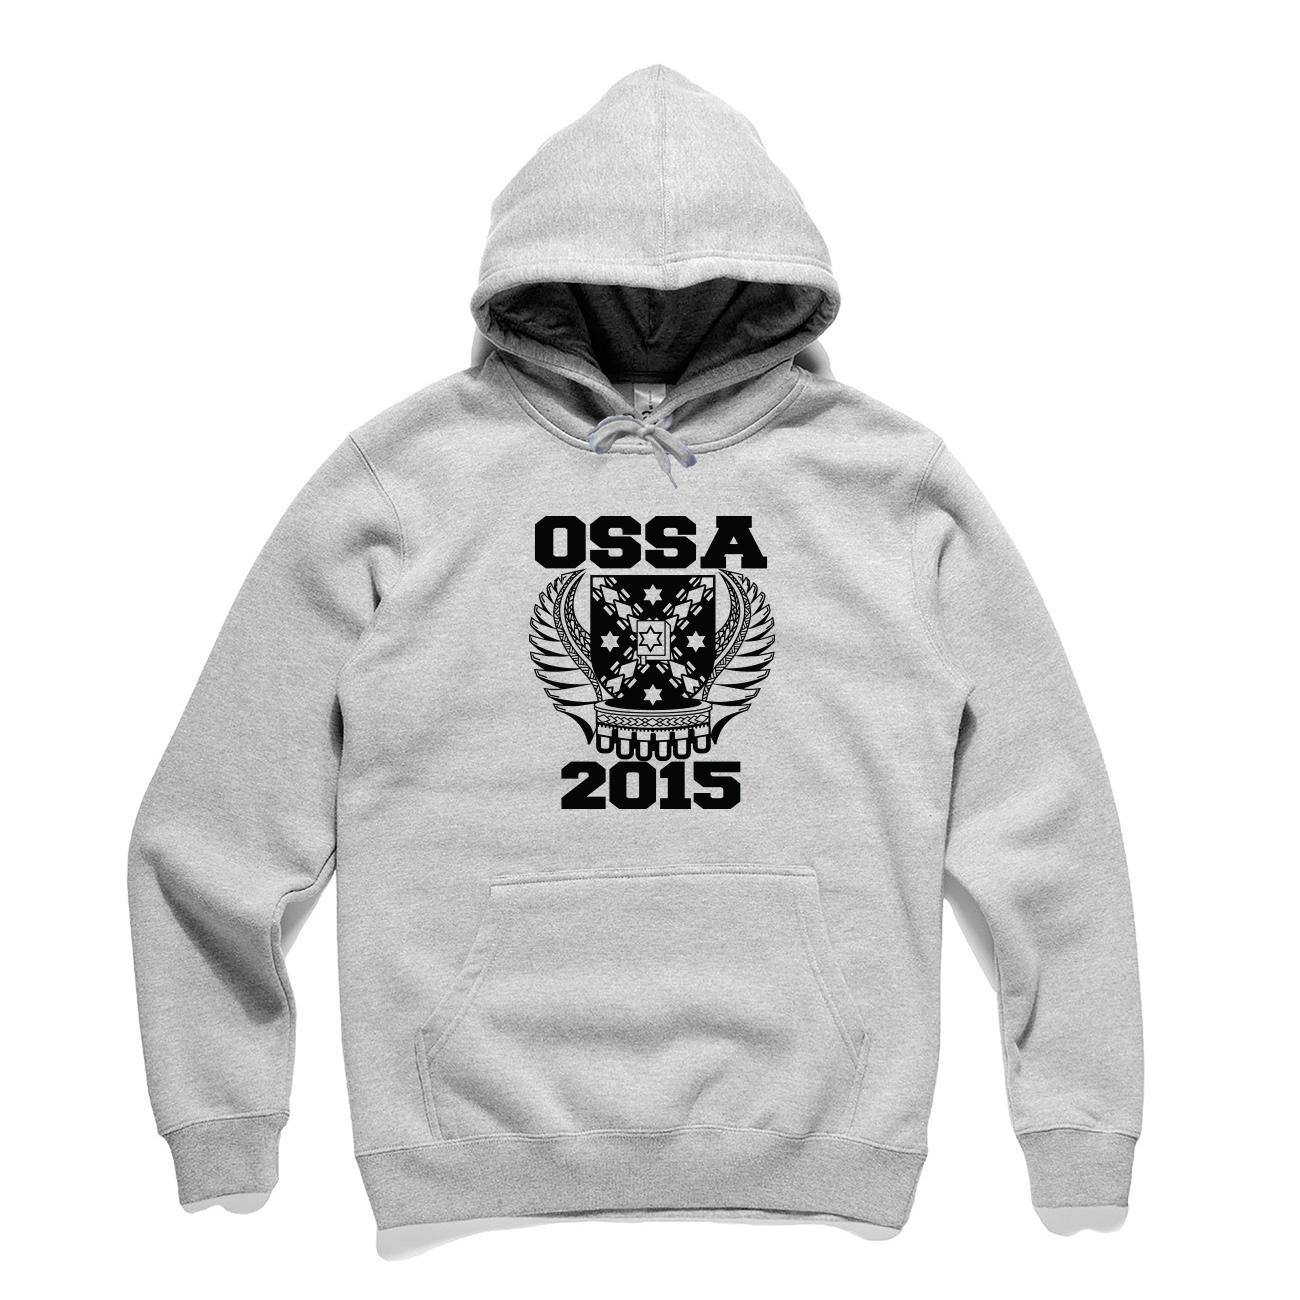 OSSA-hoodie-grey-front.jpg